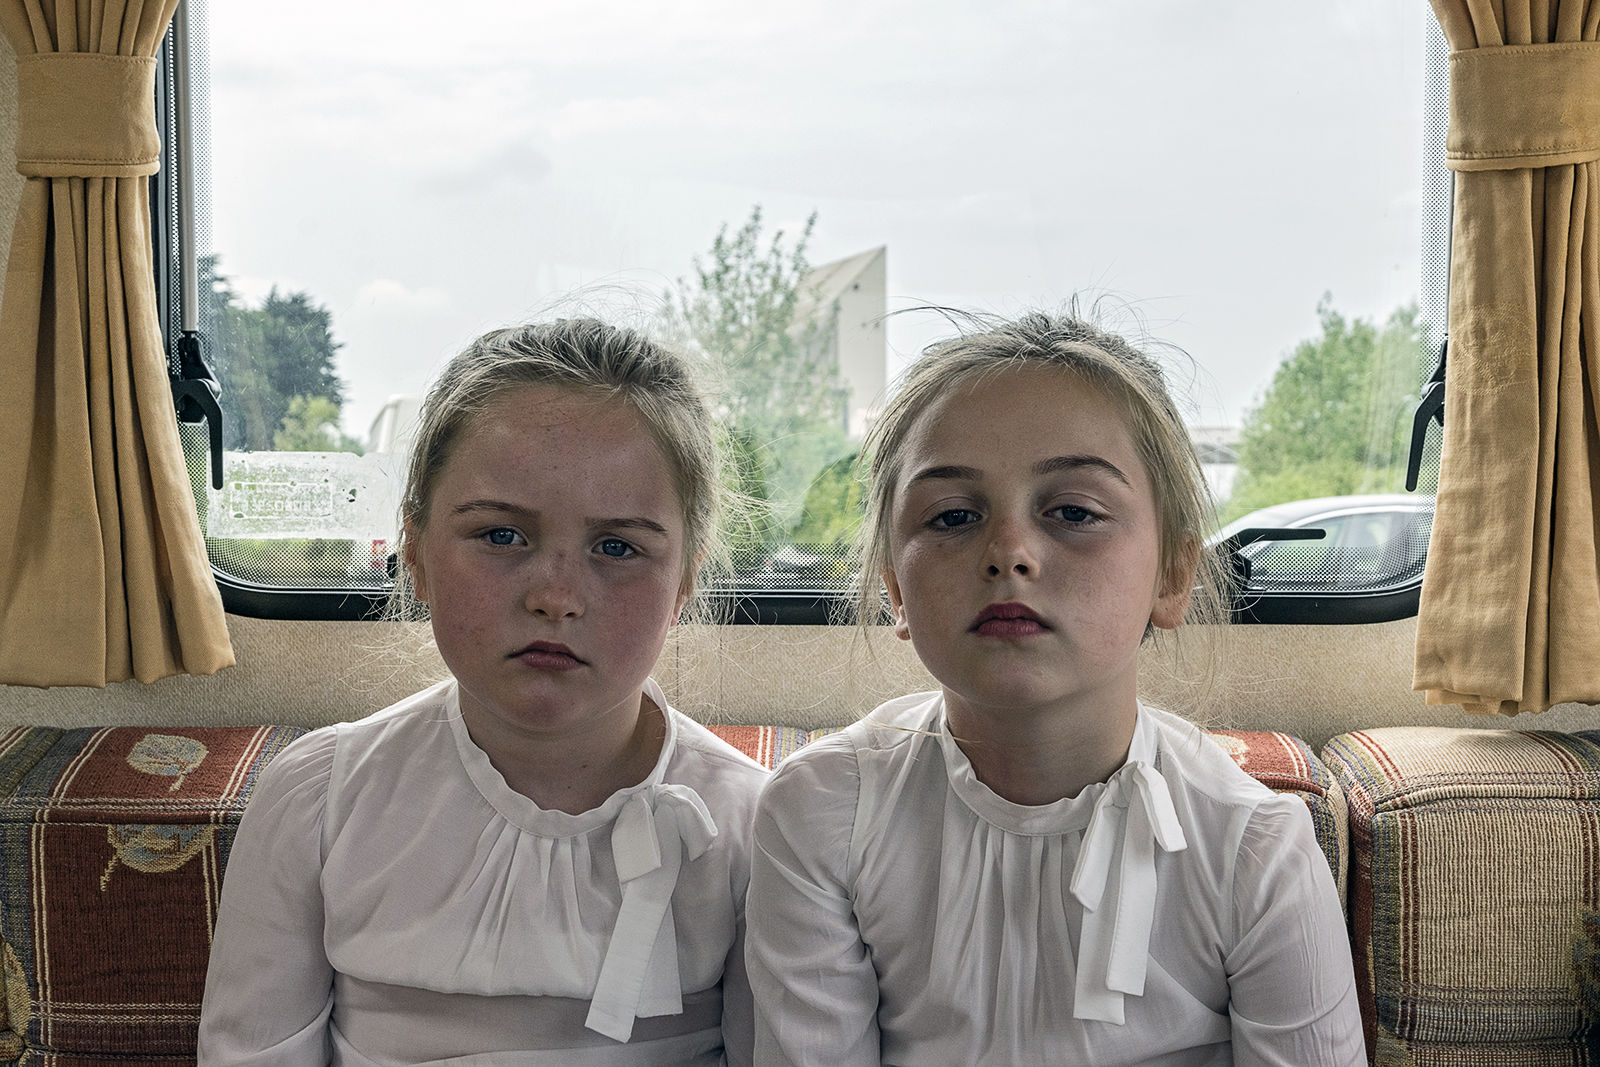 Bridget and Maggie, Fraternal Twins, Limerick, Ireland 2018